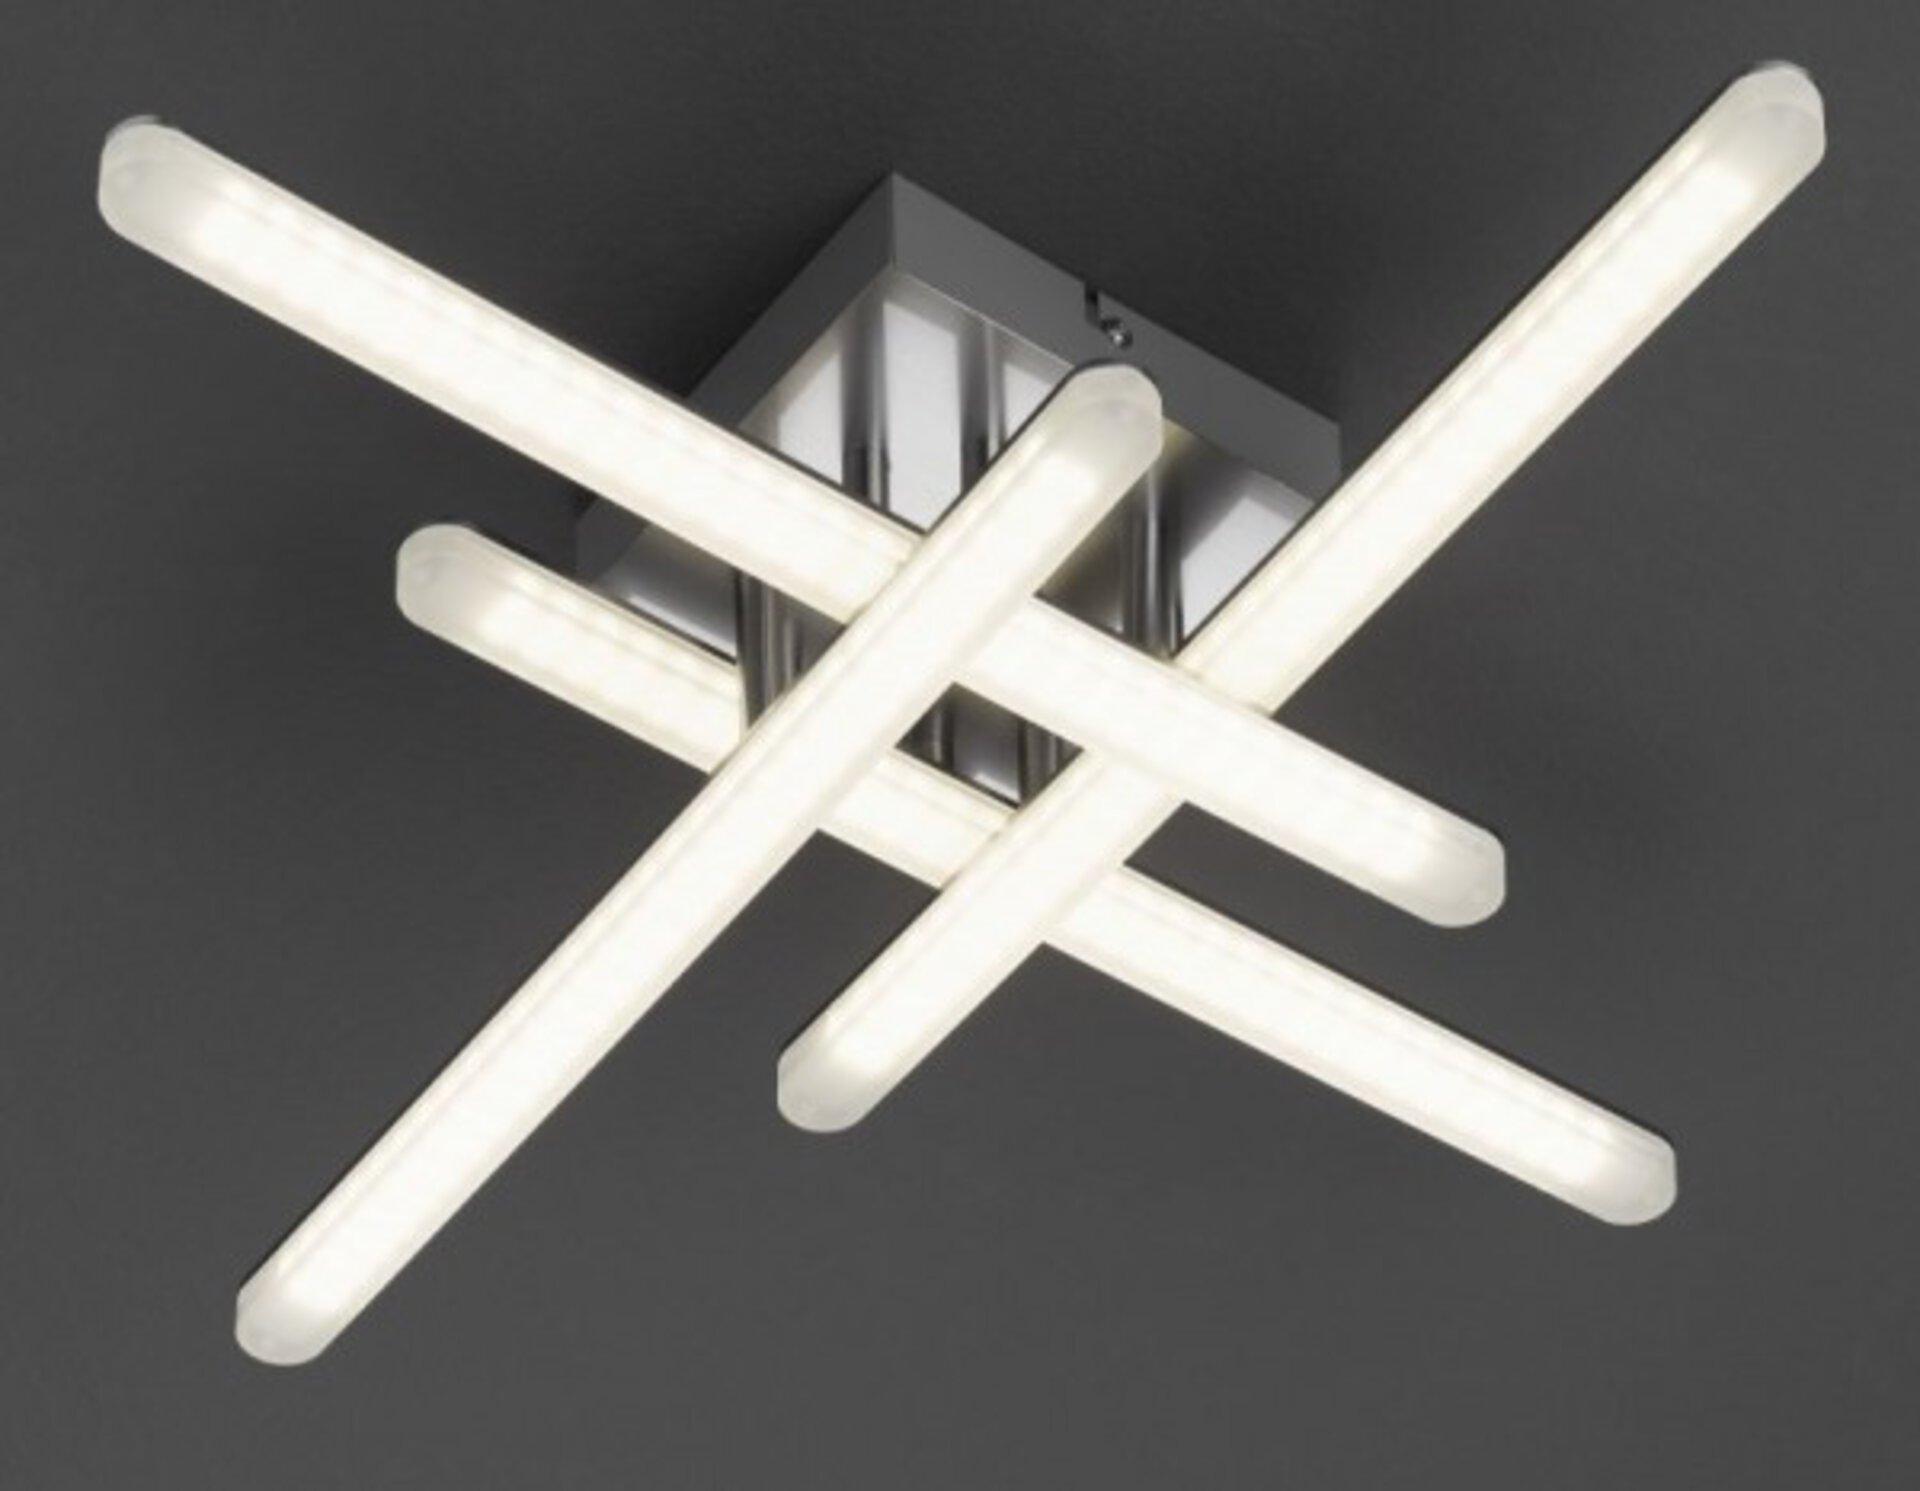 Deckenleuchte Flash Casa Nova Metall 53 x 10 x 53 cm